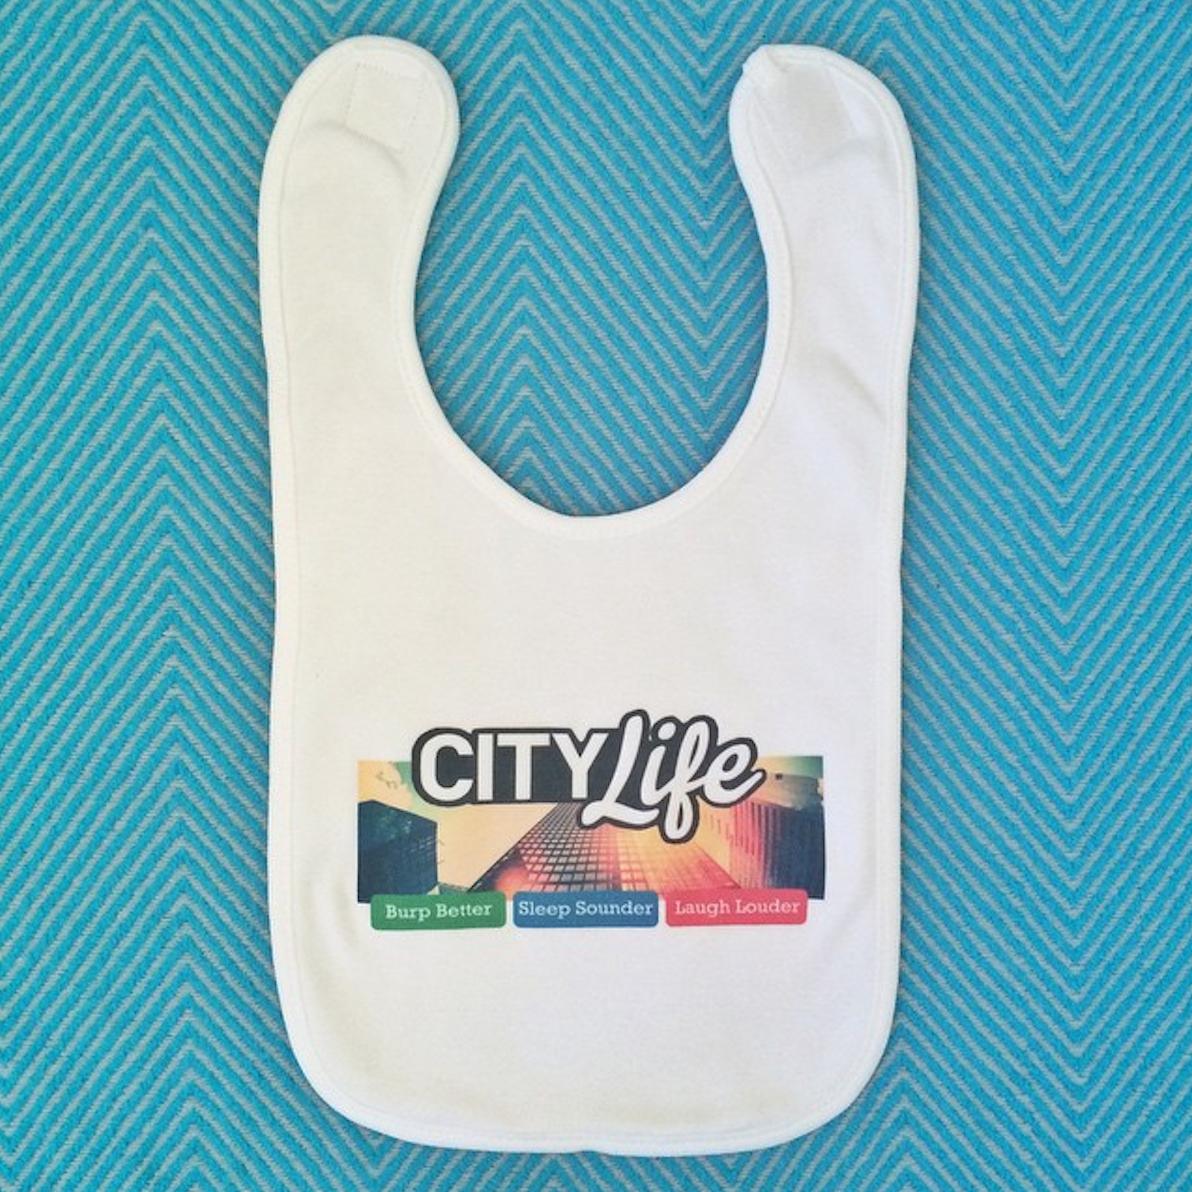 A Design Your Own Bib - City Life